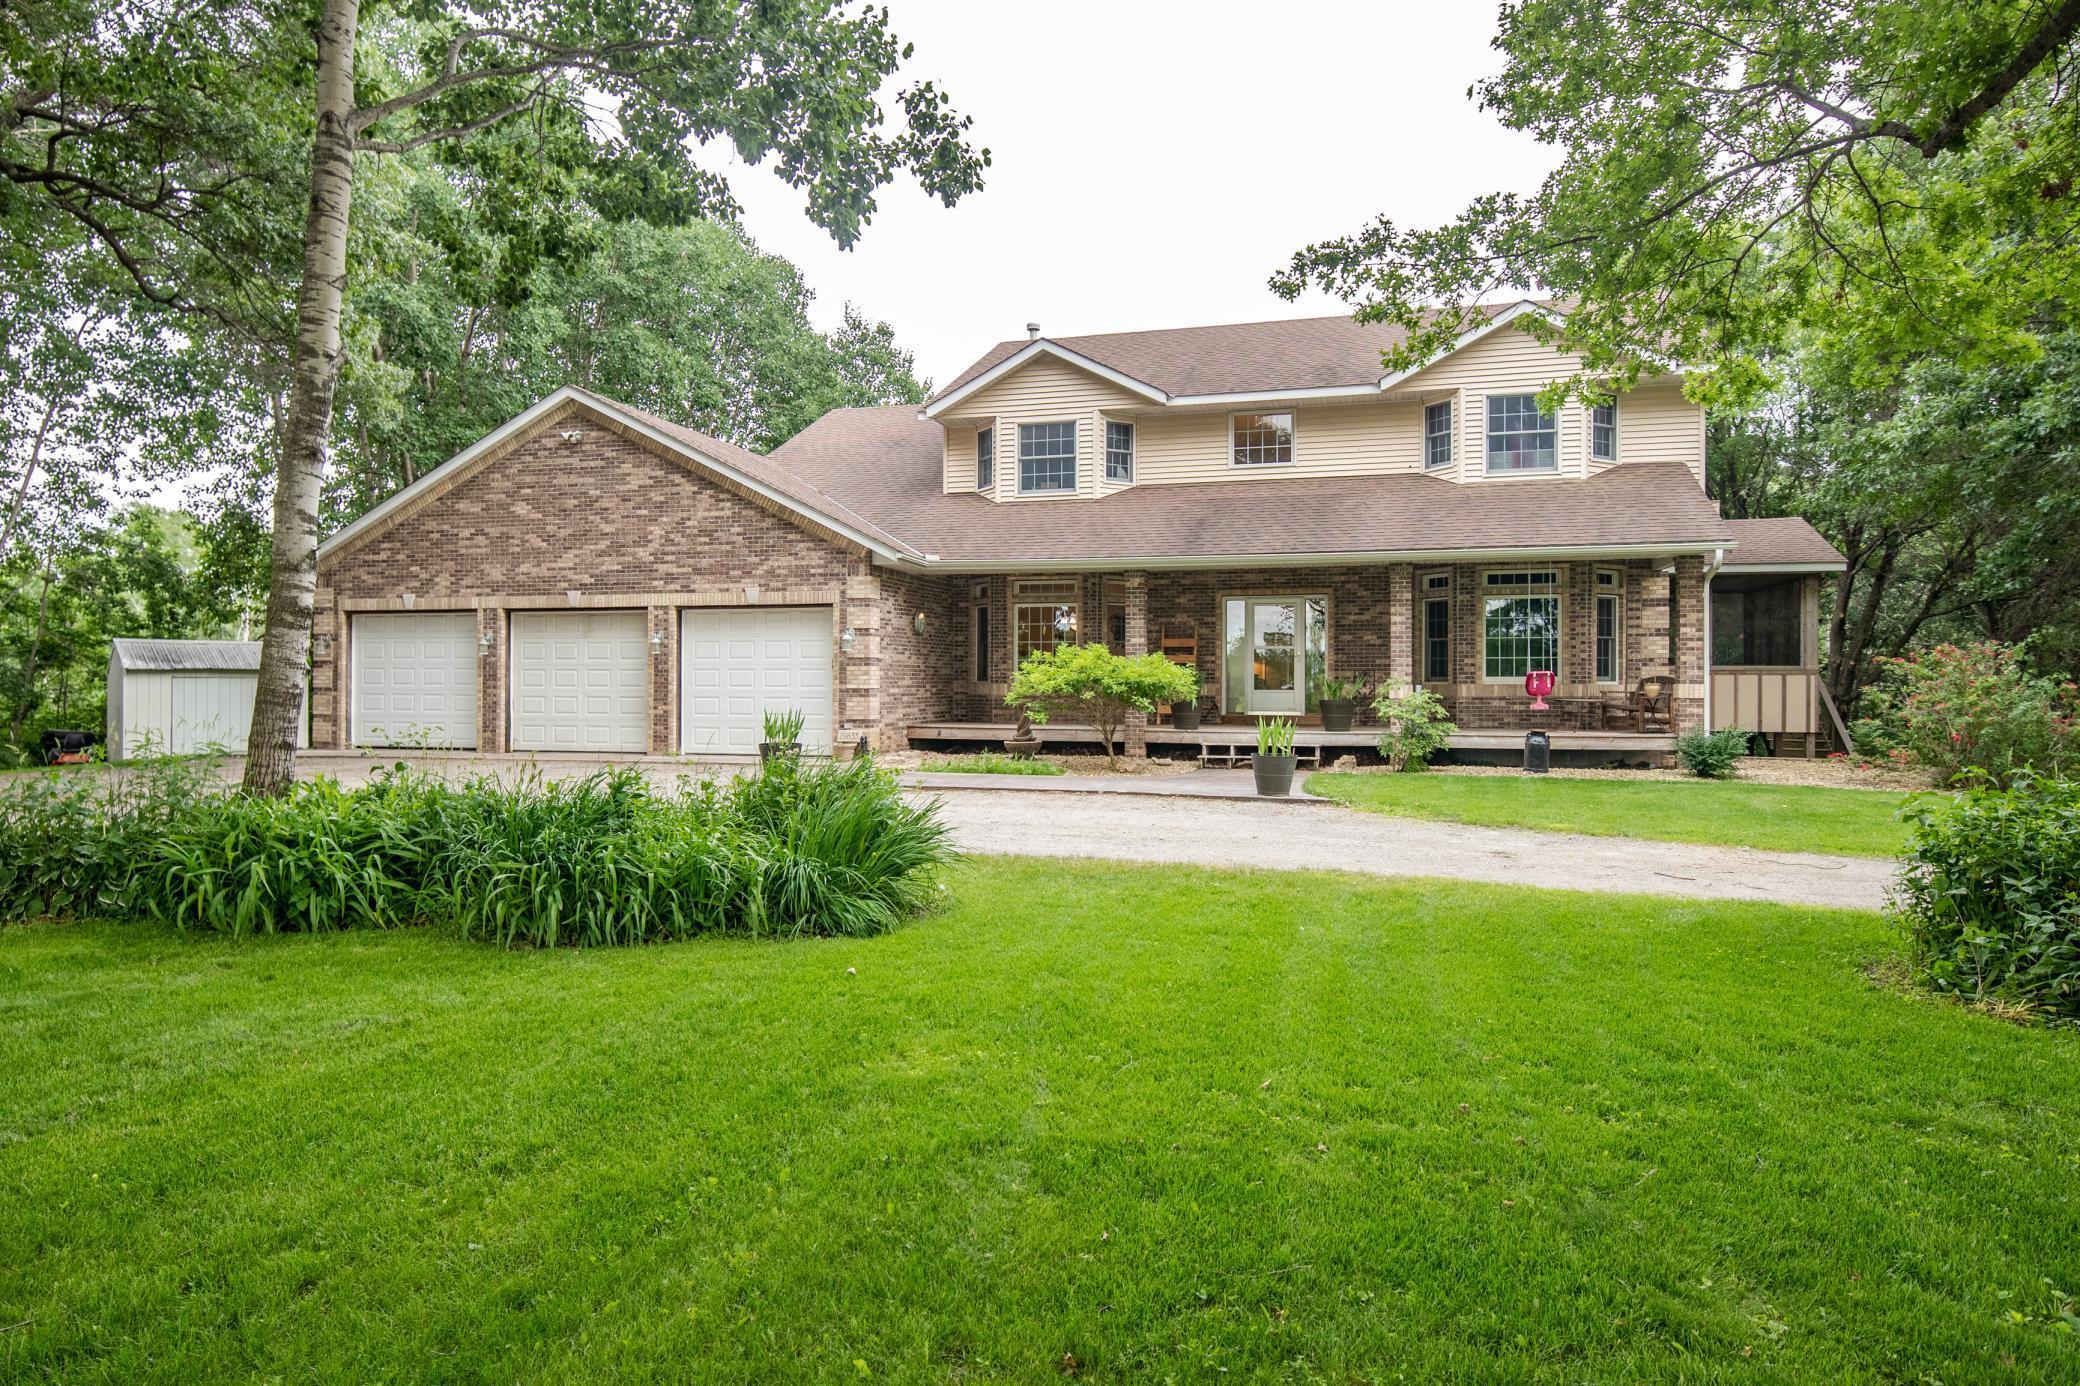 29833 137th Street NW Property Photo - Princeton, MN real estate listing